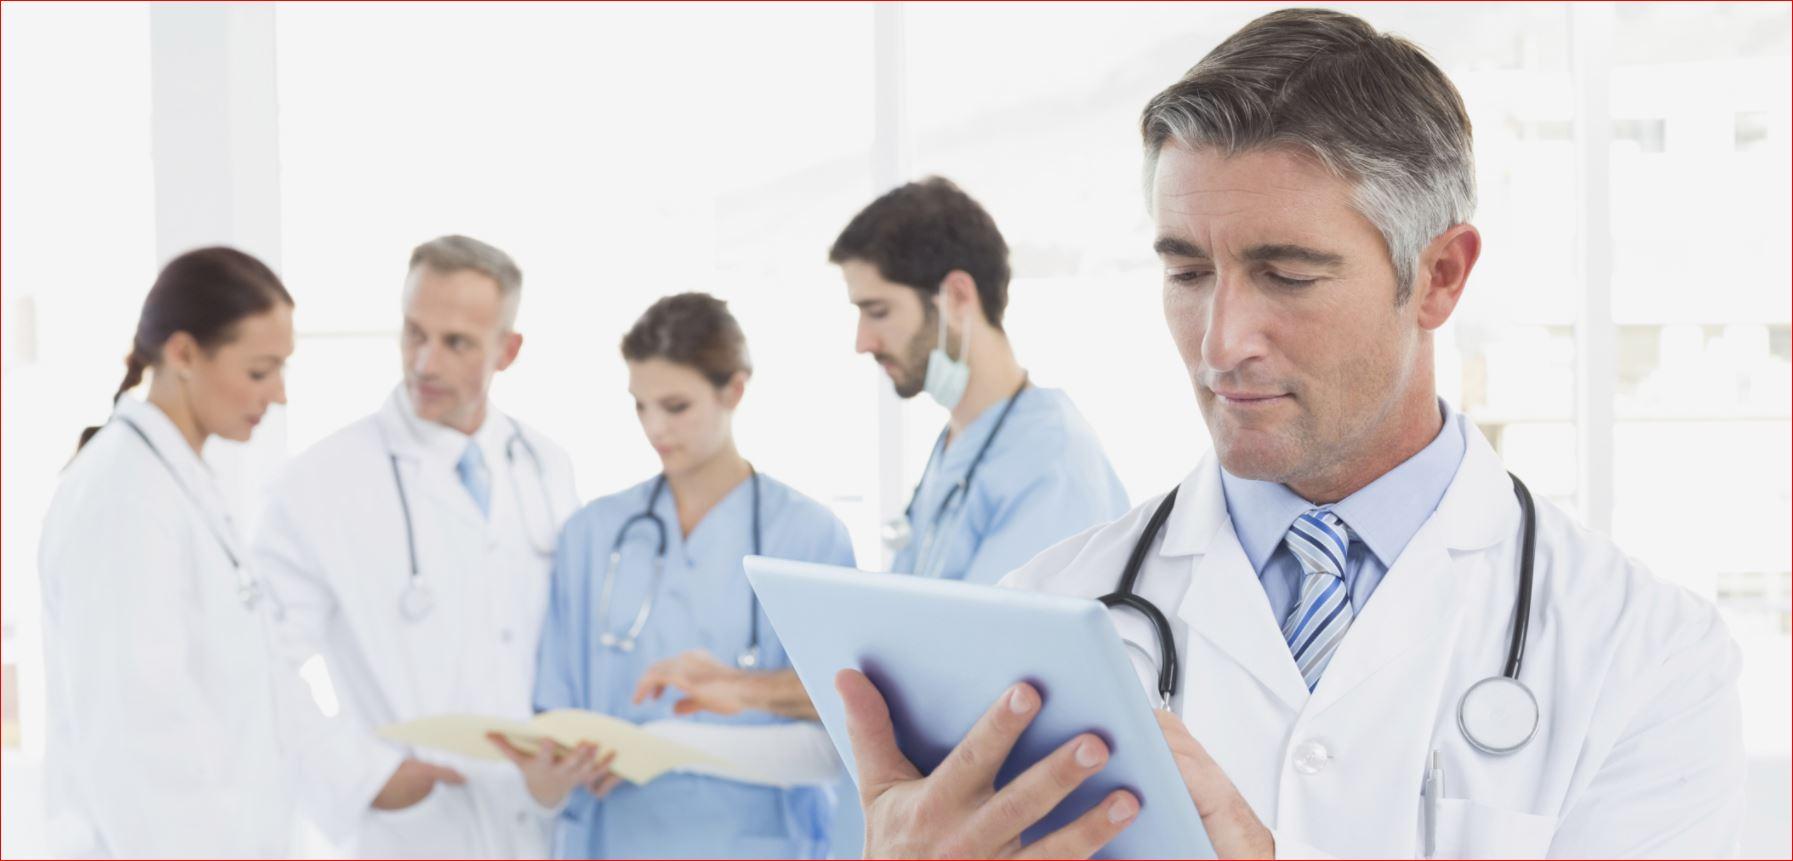 Orlando Health Employee Benefits